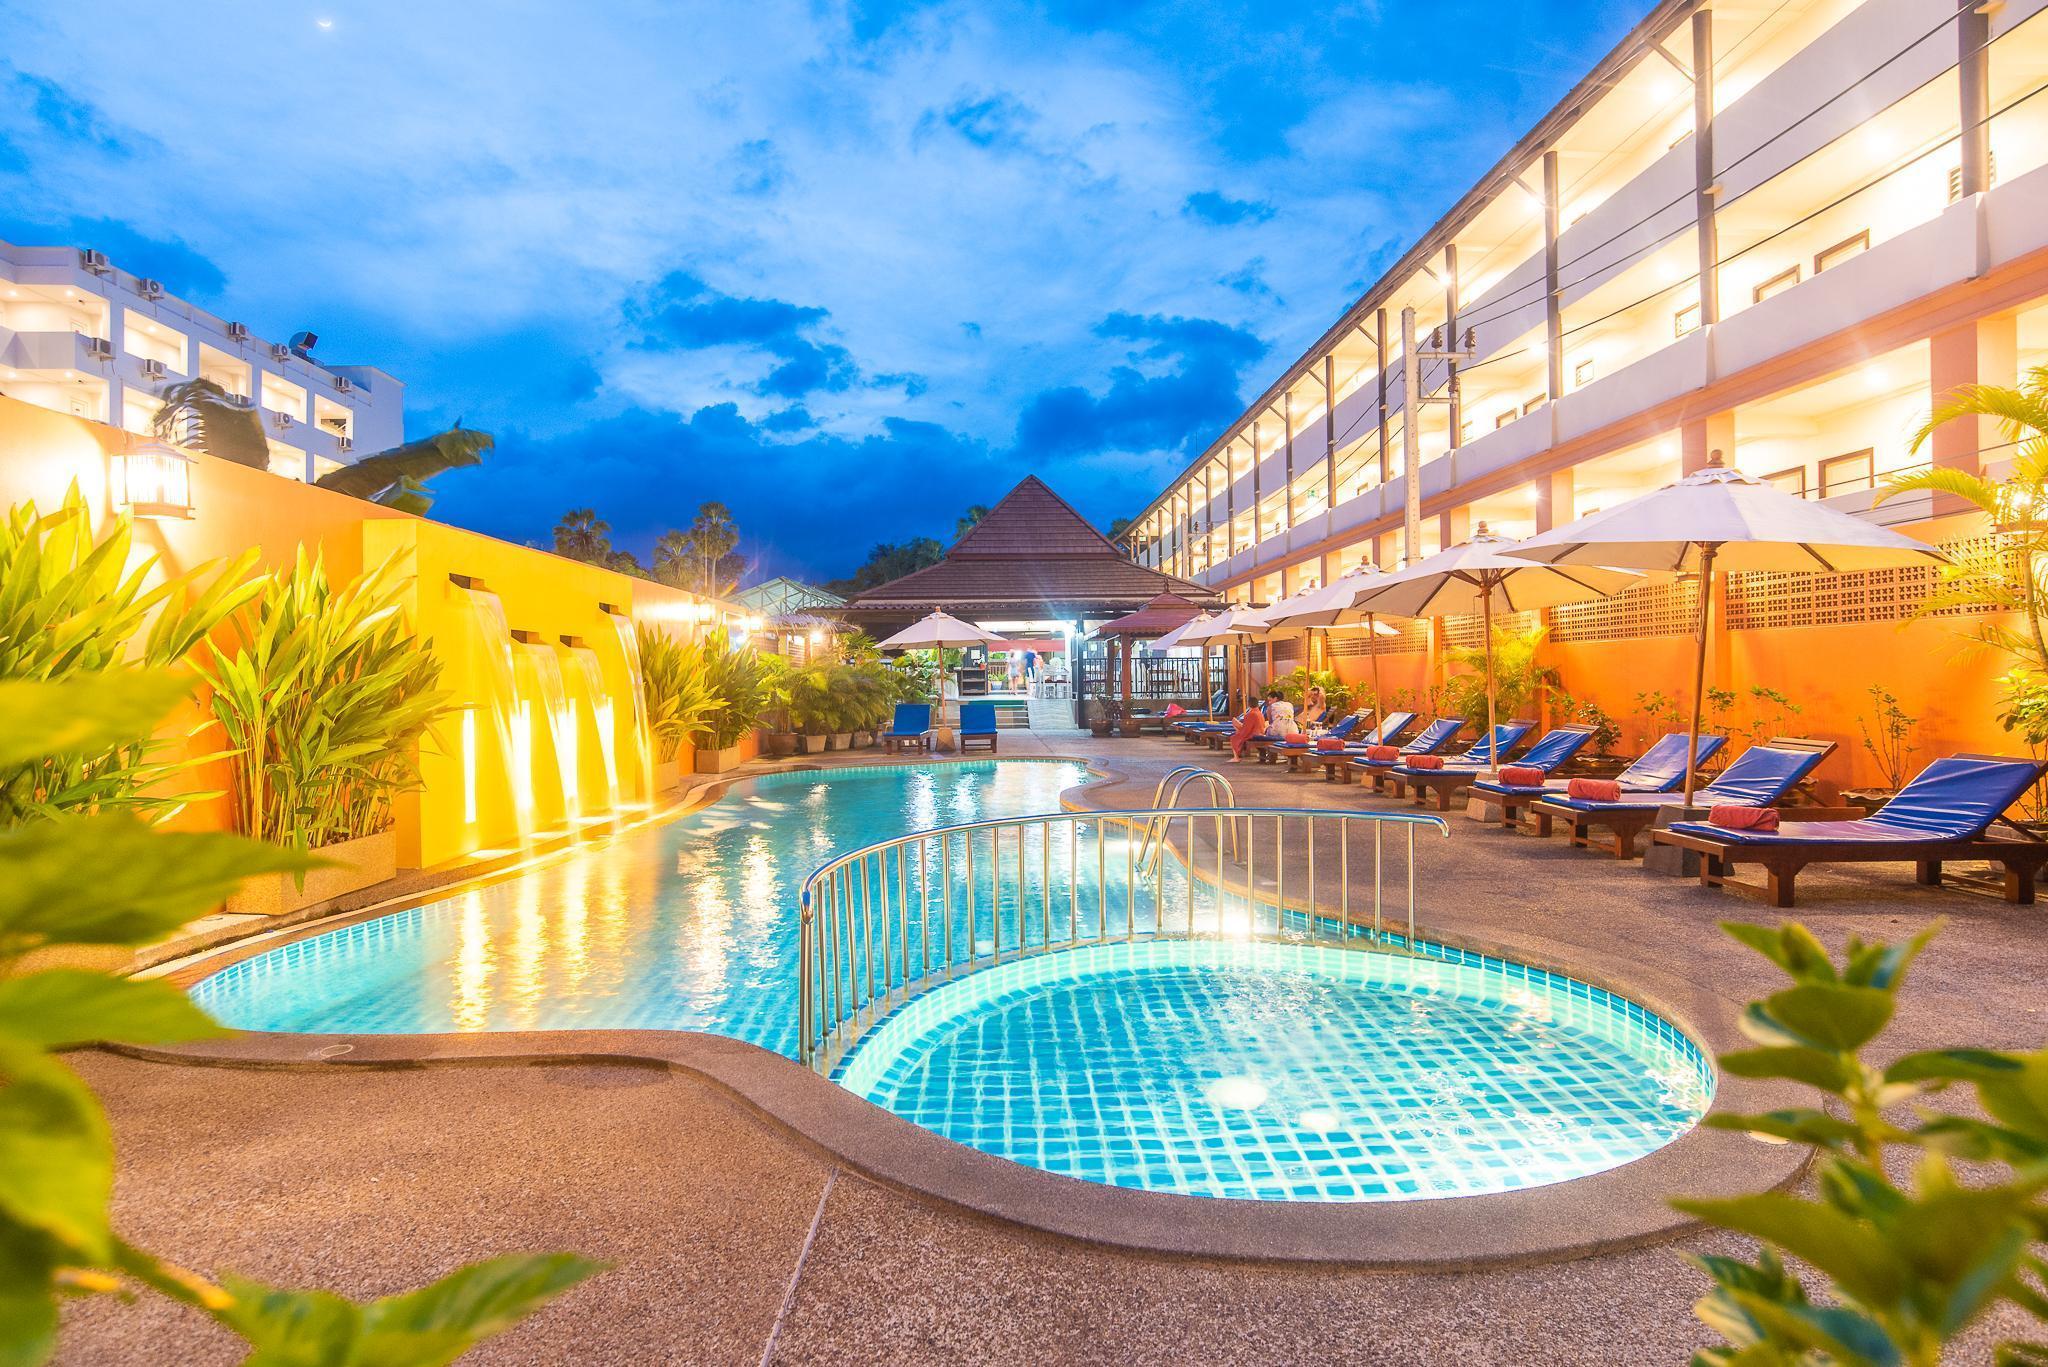 Kata Silver Sand Hotel by Eazy โรงแรมกะตะ ซิลเวอร์แซนด์ บาย อีซ๊่